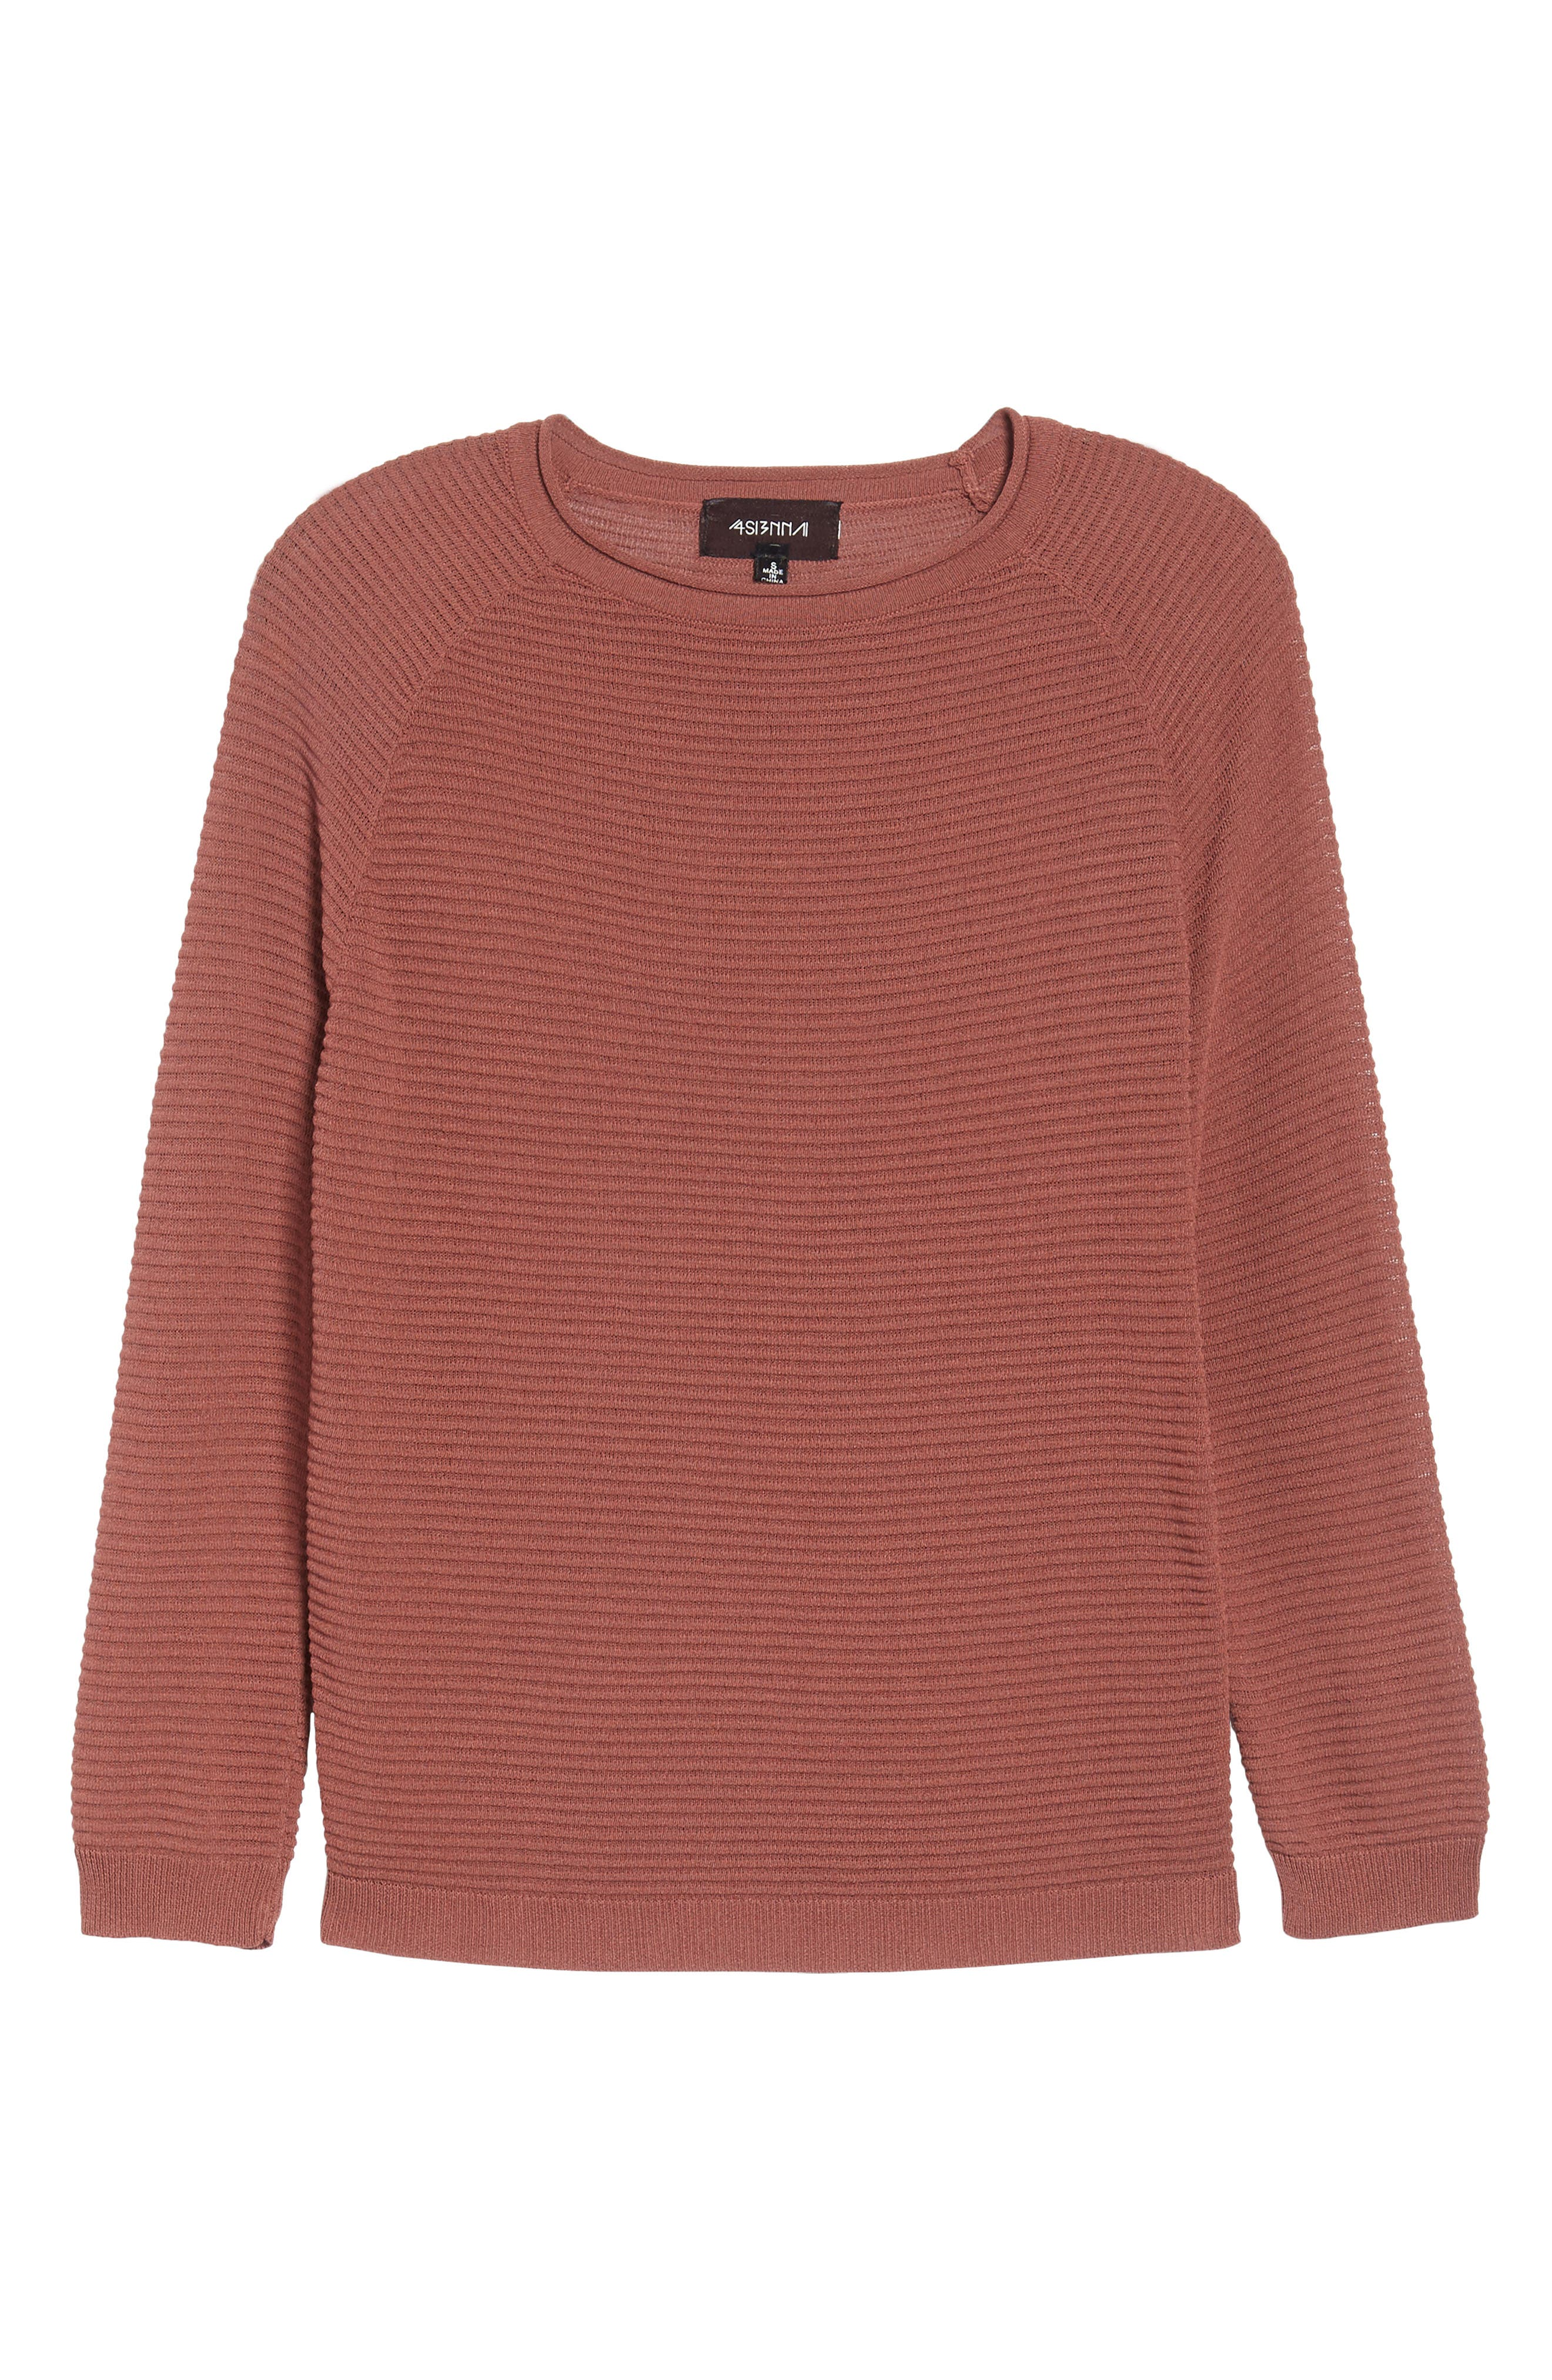 Ribbed Sweatshirt,                             Alternate thumbnail 6, color,                             240